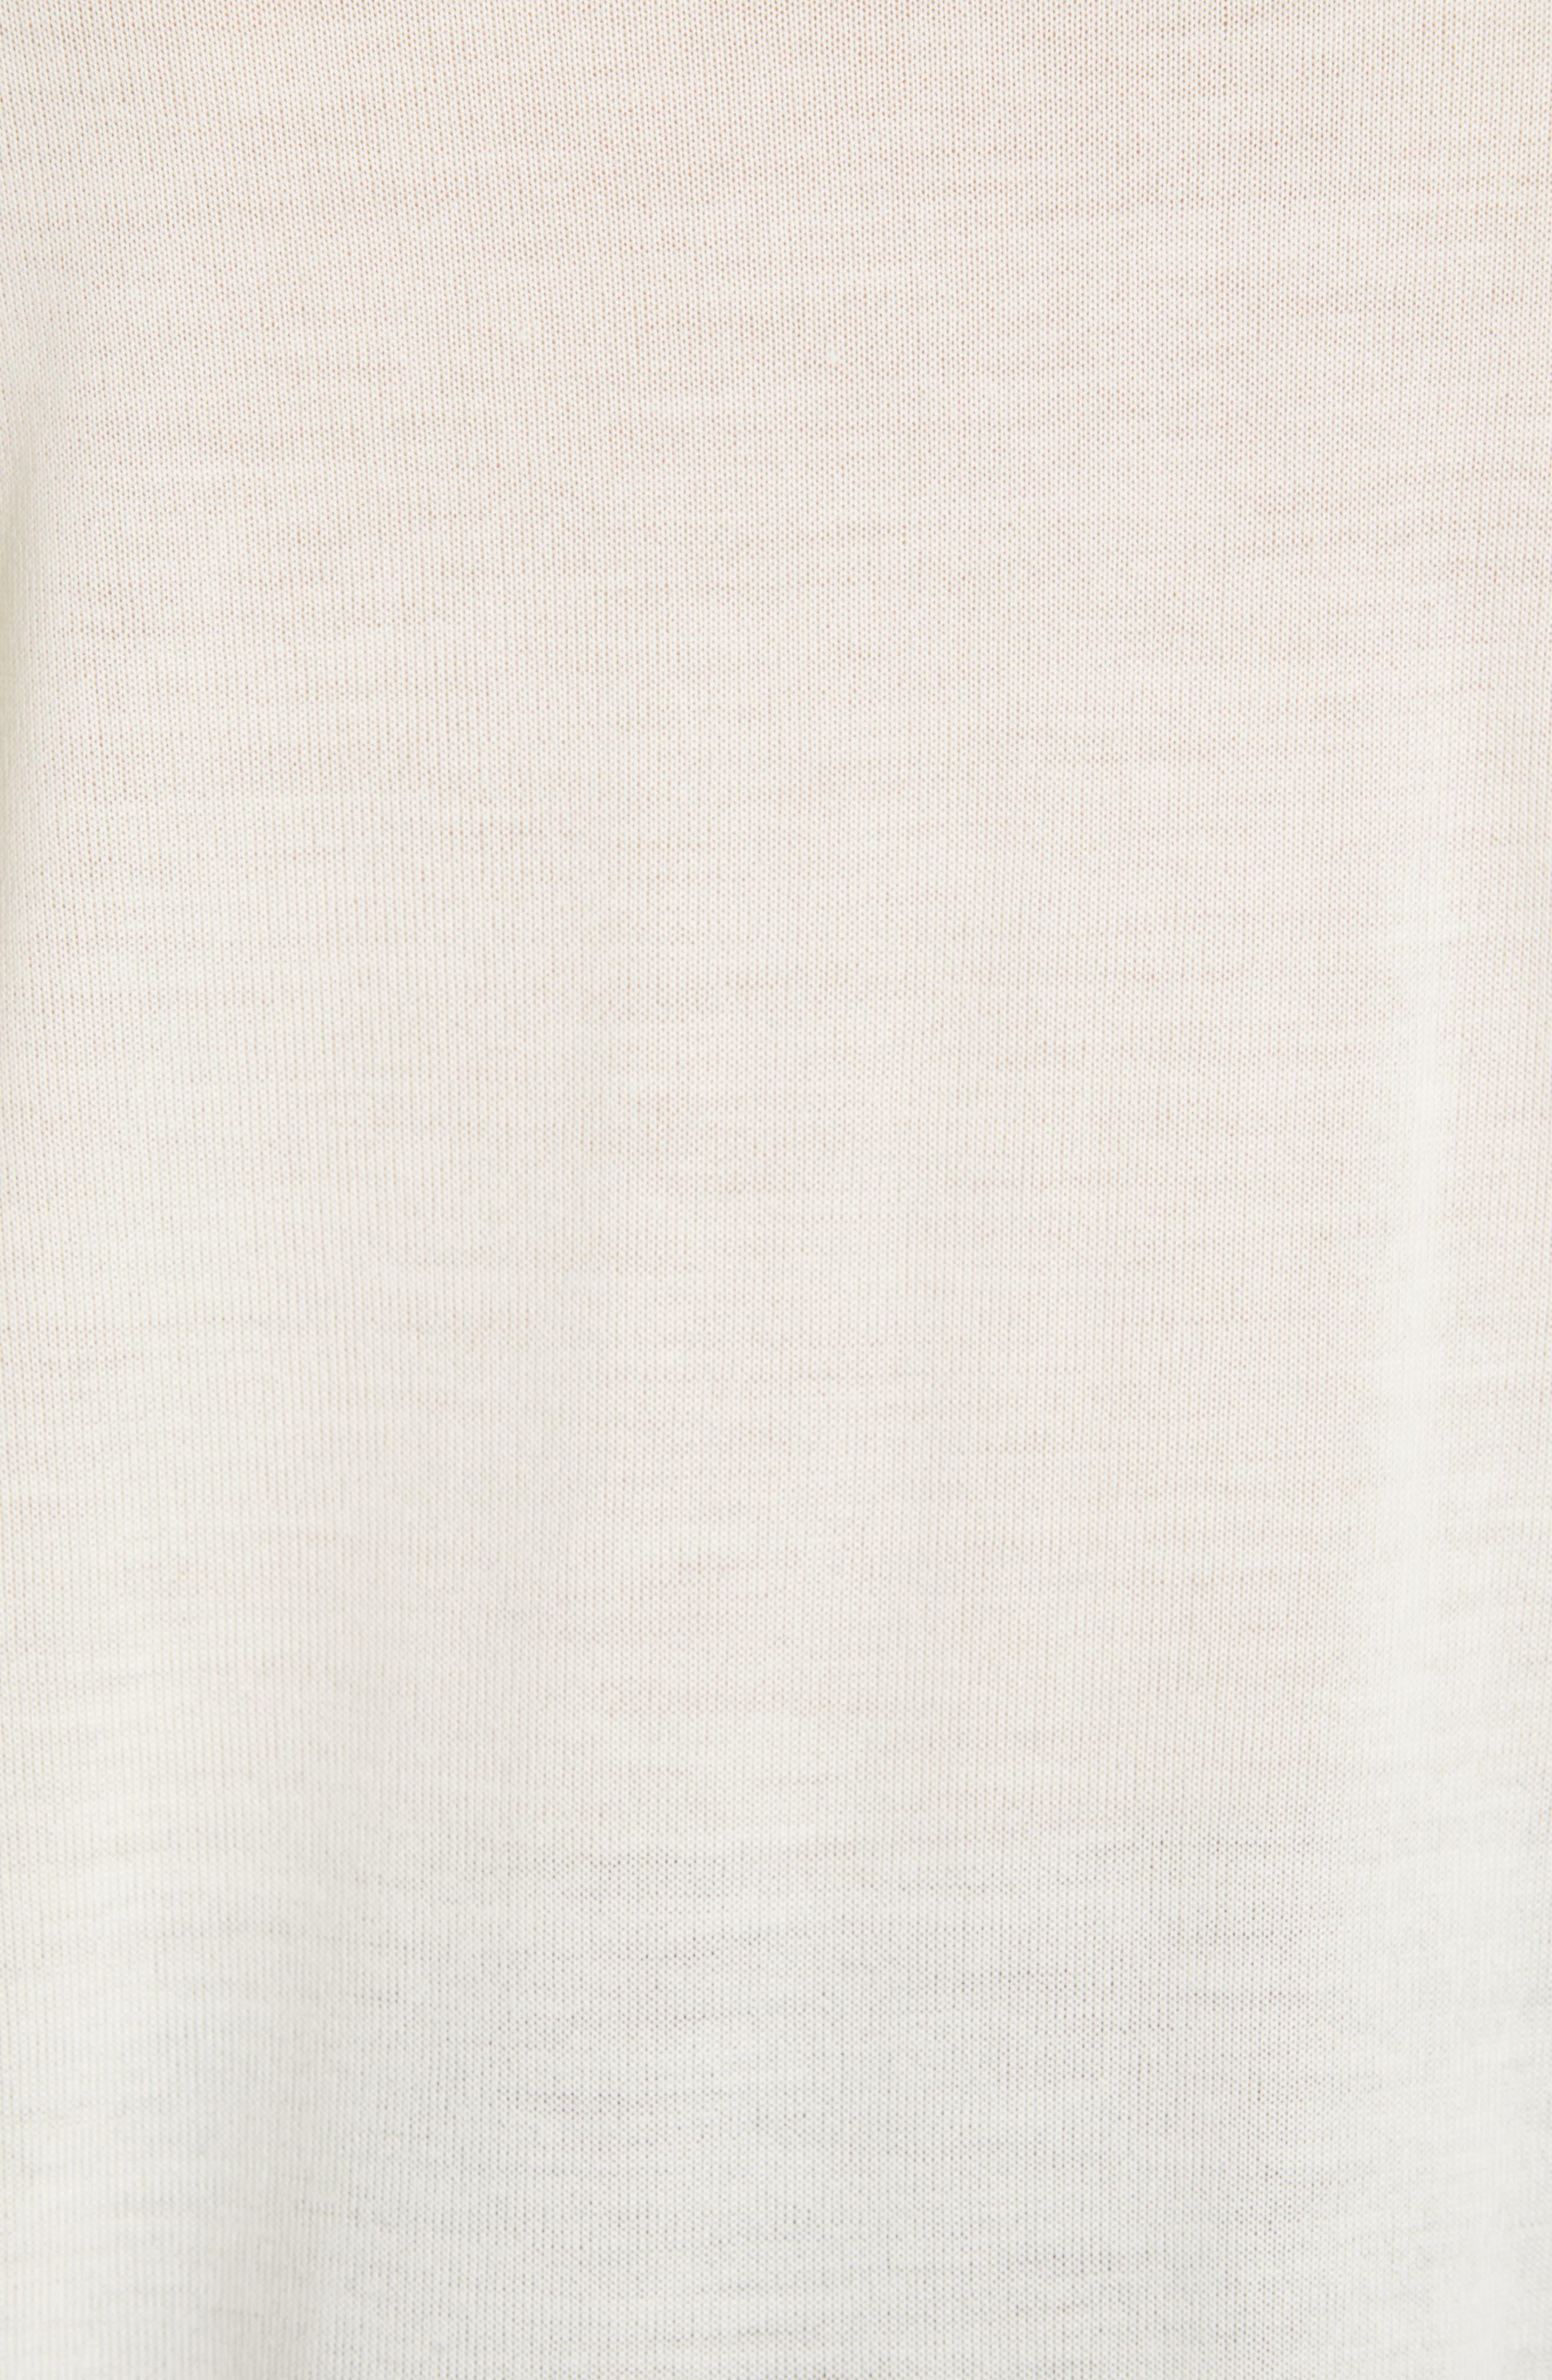 CALVIN KLEIN 205W39NYC, Contrast Stripe Wool Blend Sweater, Alternate thumbnail 6, color, WHITE BLACK TOURNESOL